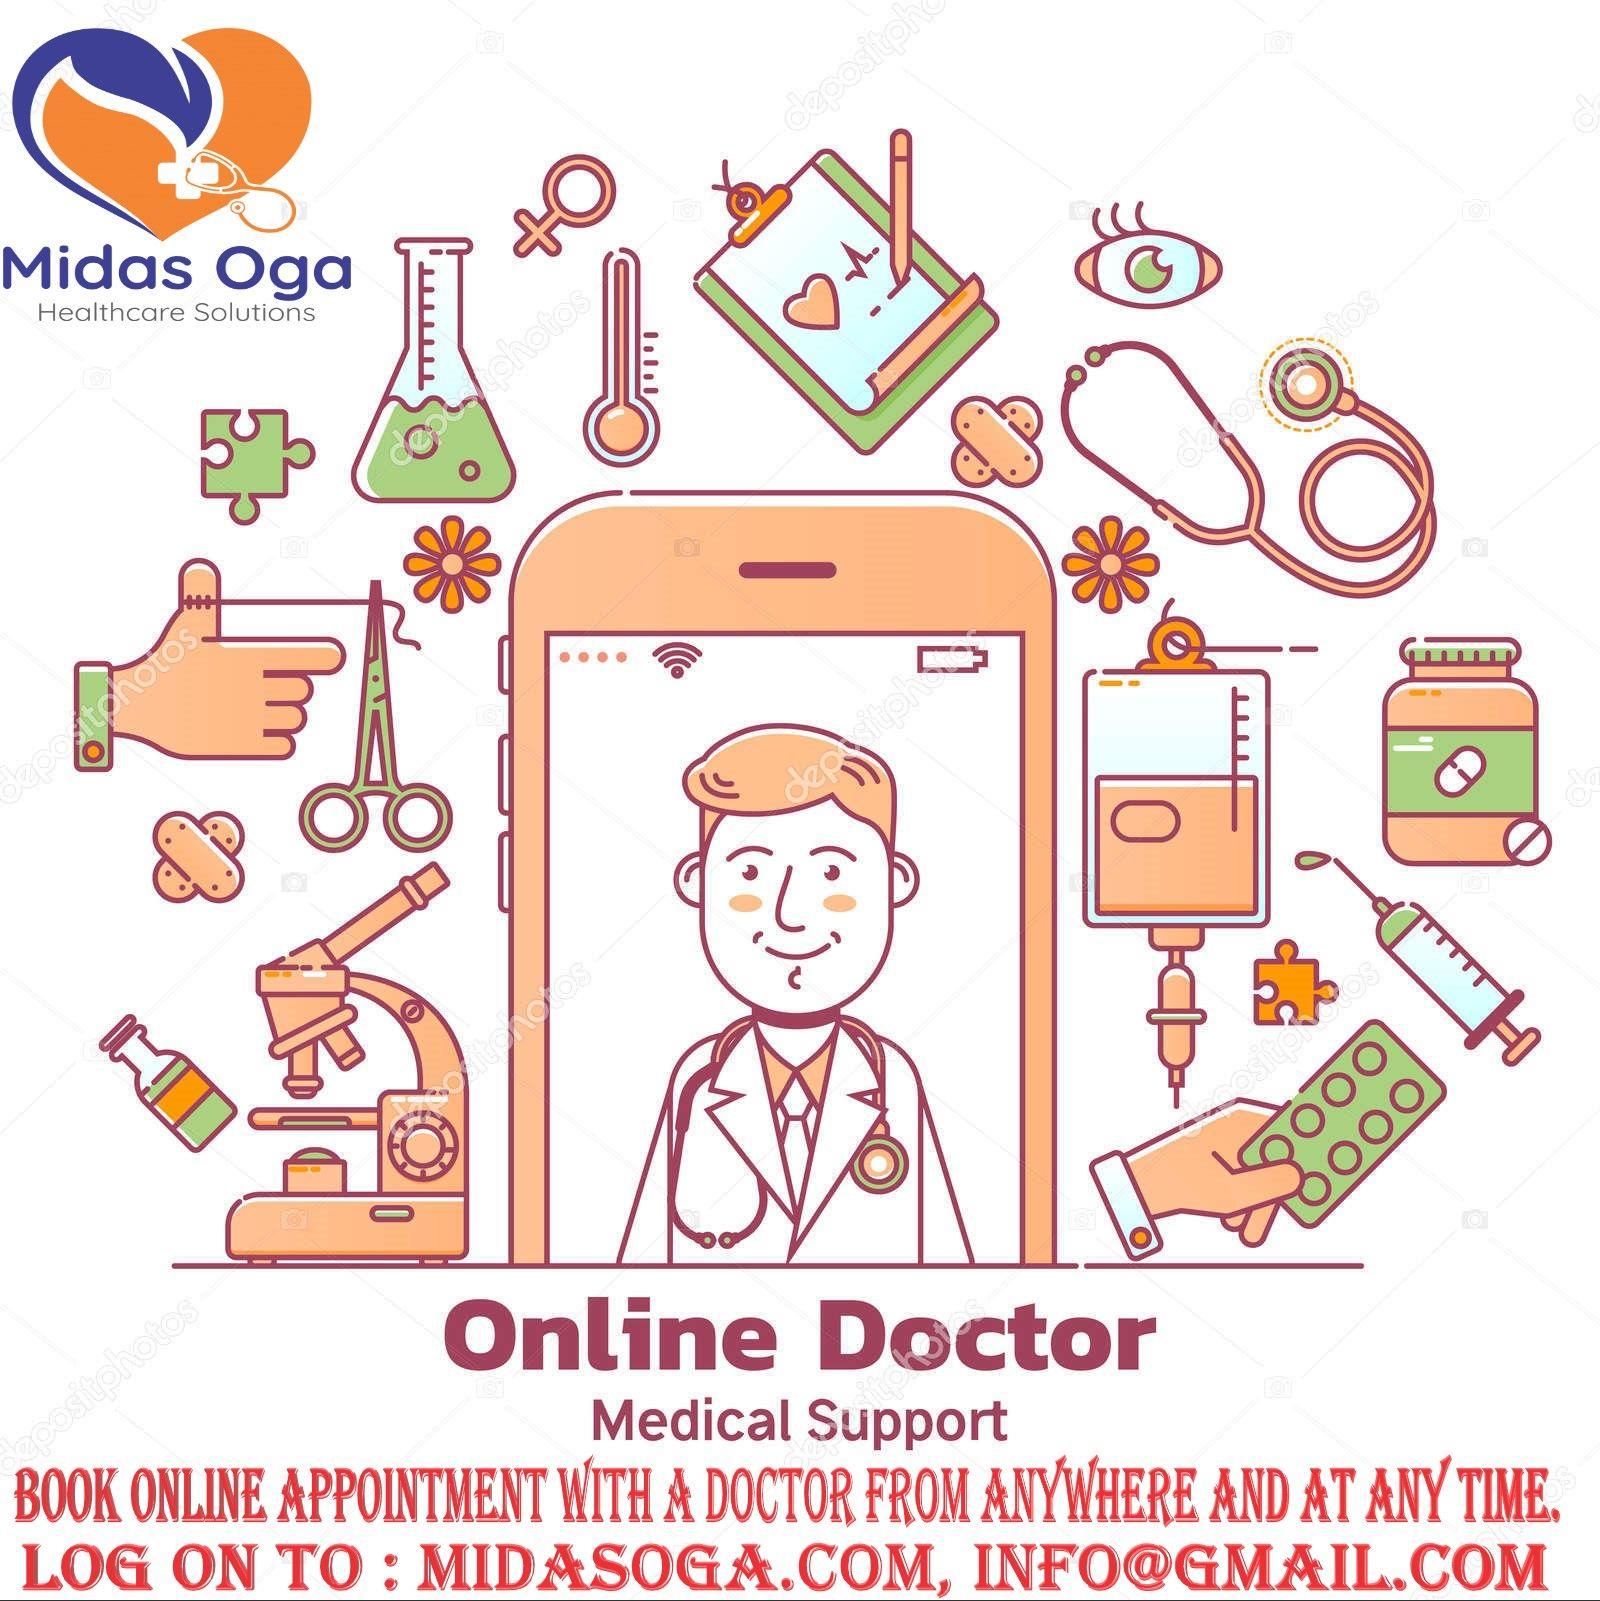 midas oga best telemedicine company in india . midas oga